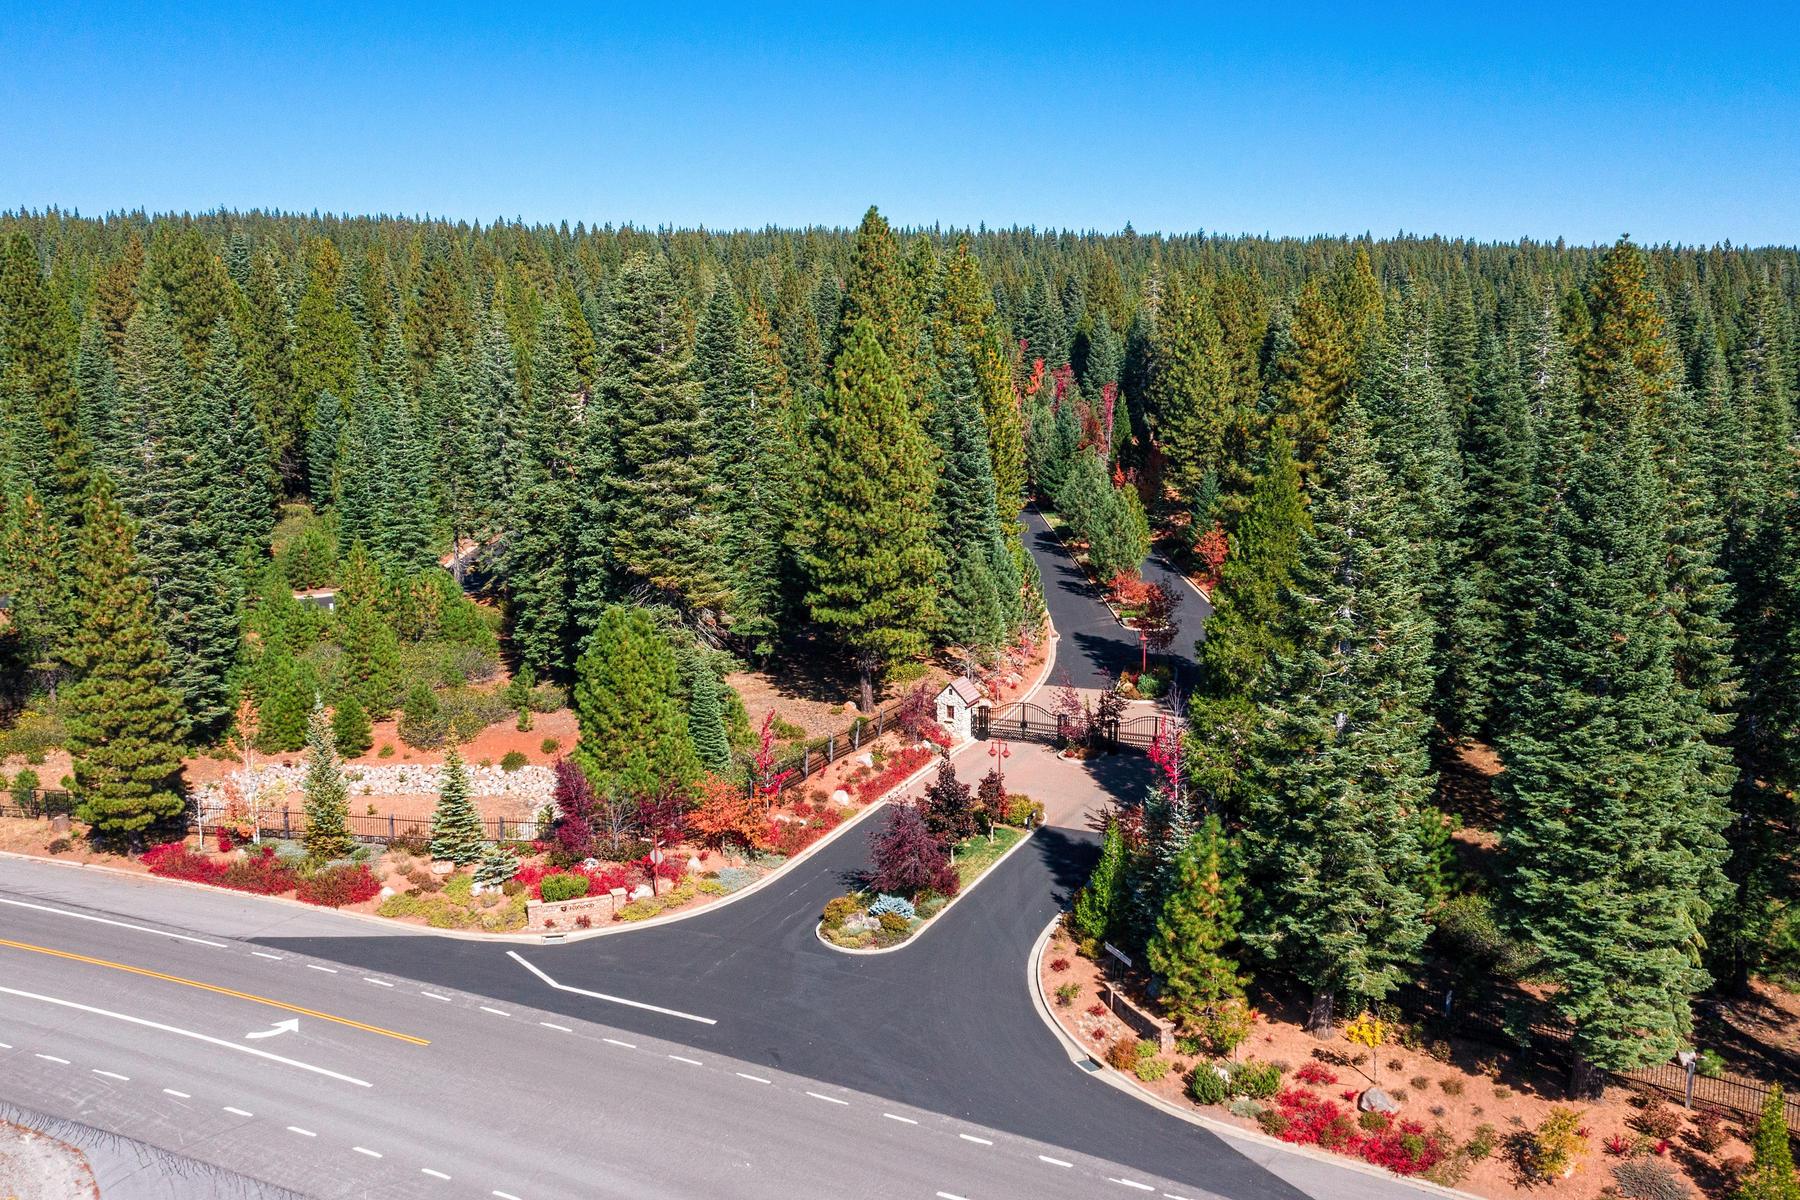 Additional photo for property listing at 2716 Walker Memorial Highway Lake Almanor California 96137 2716 Walker Memorial Highway A-13 Lake Almanor, 加利福尼亚州 96137 美国